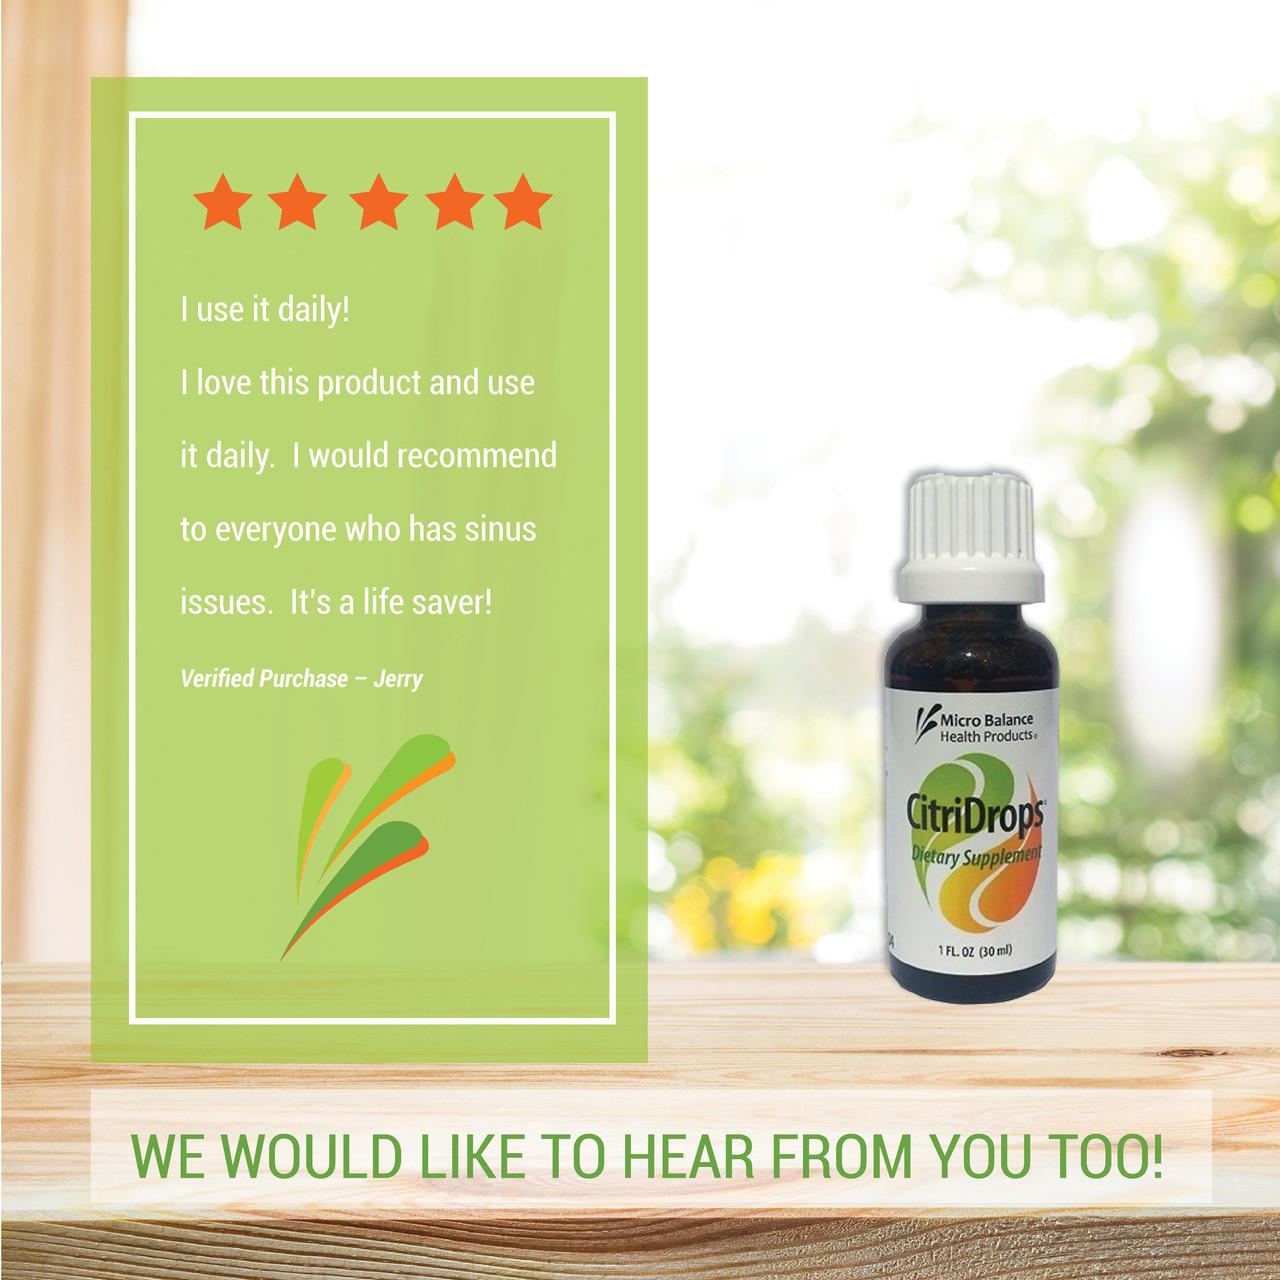 CitriDrops Dietary Supplement